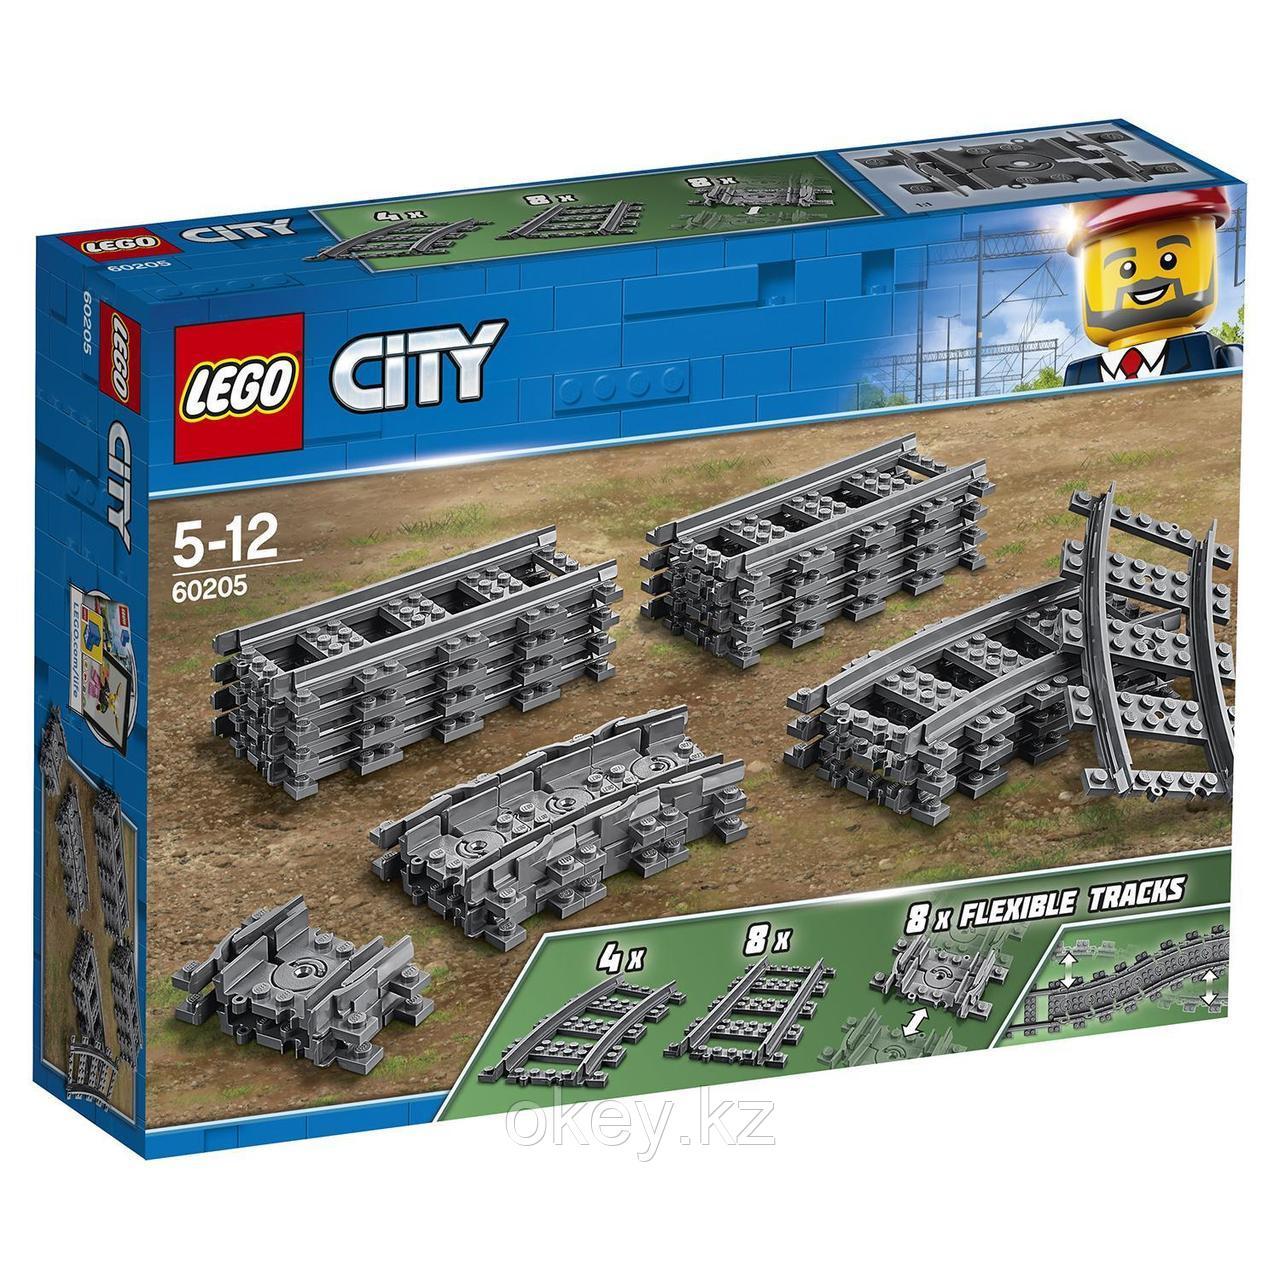 LEGO City: Рельсы 60205